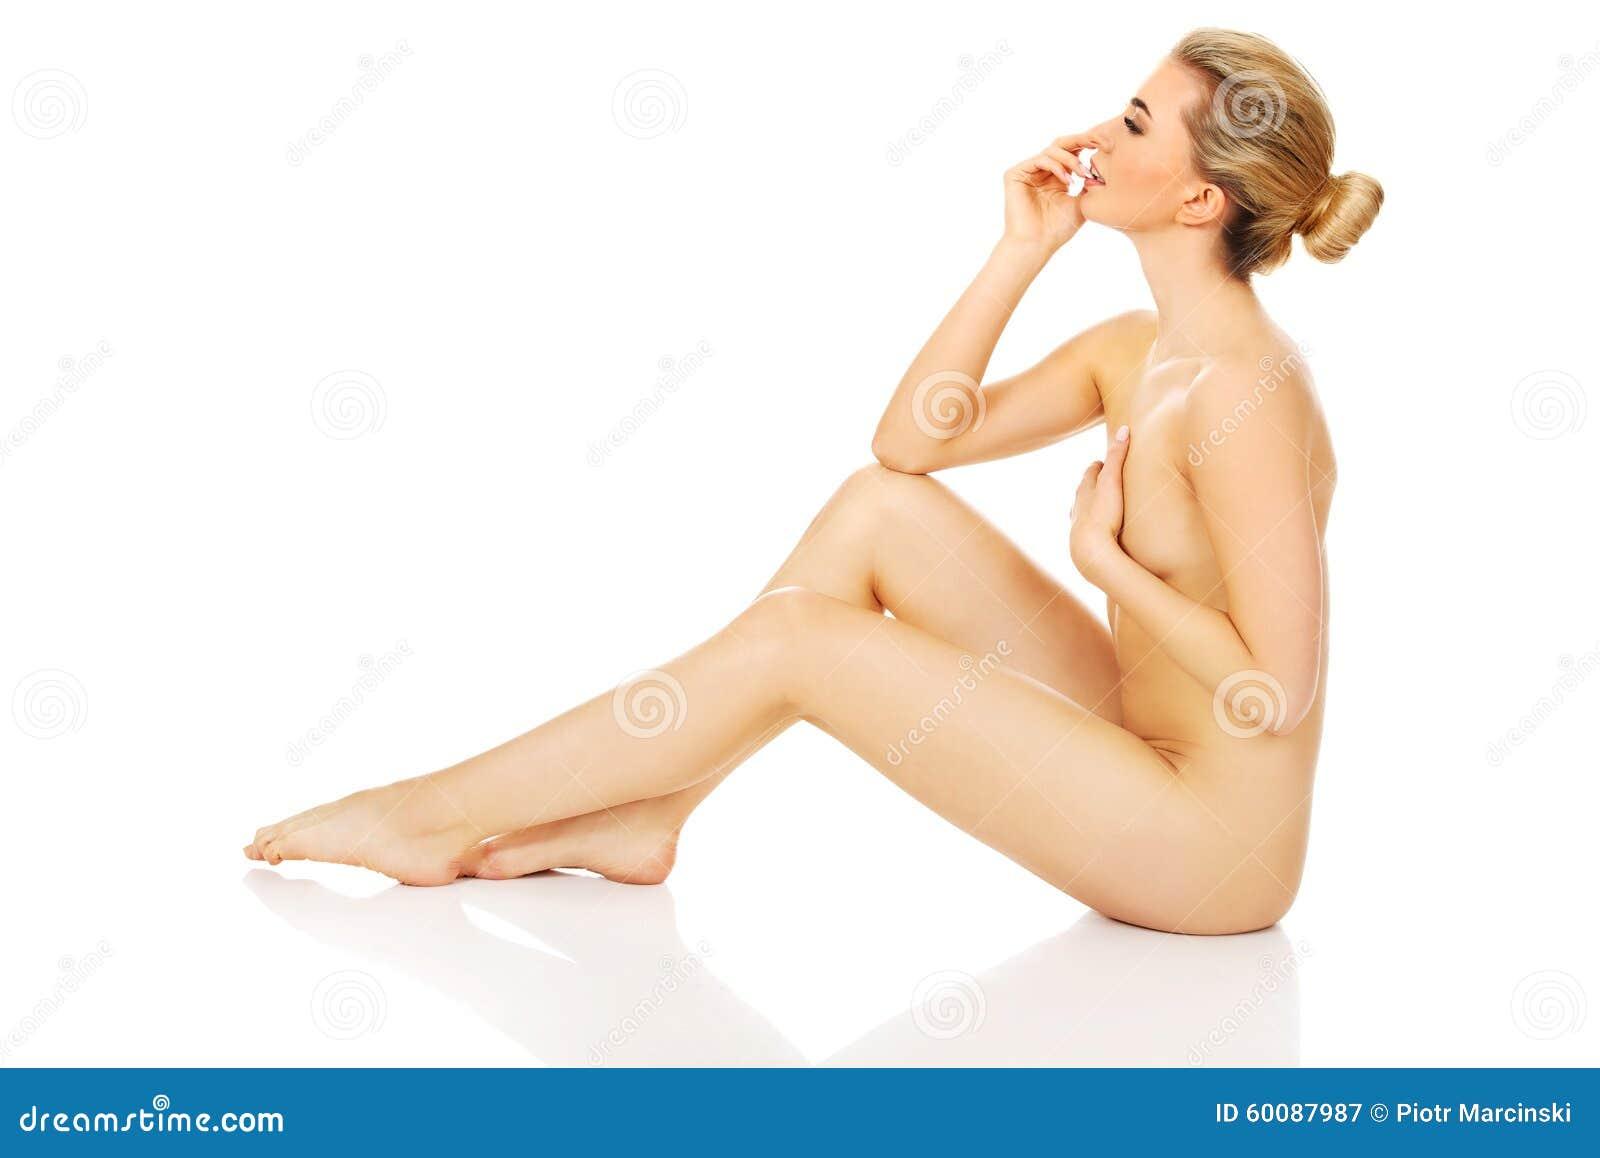 Reema sen hot nude fucking